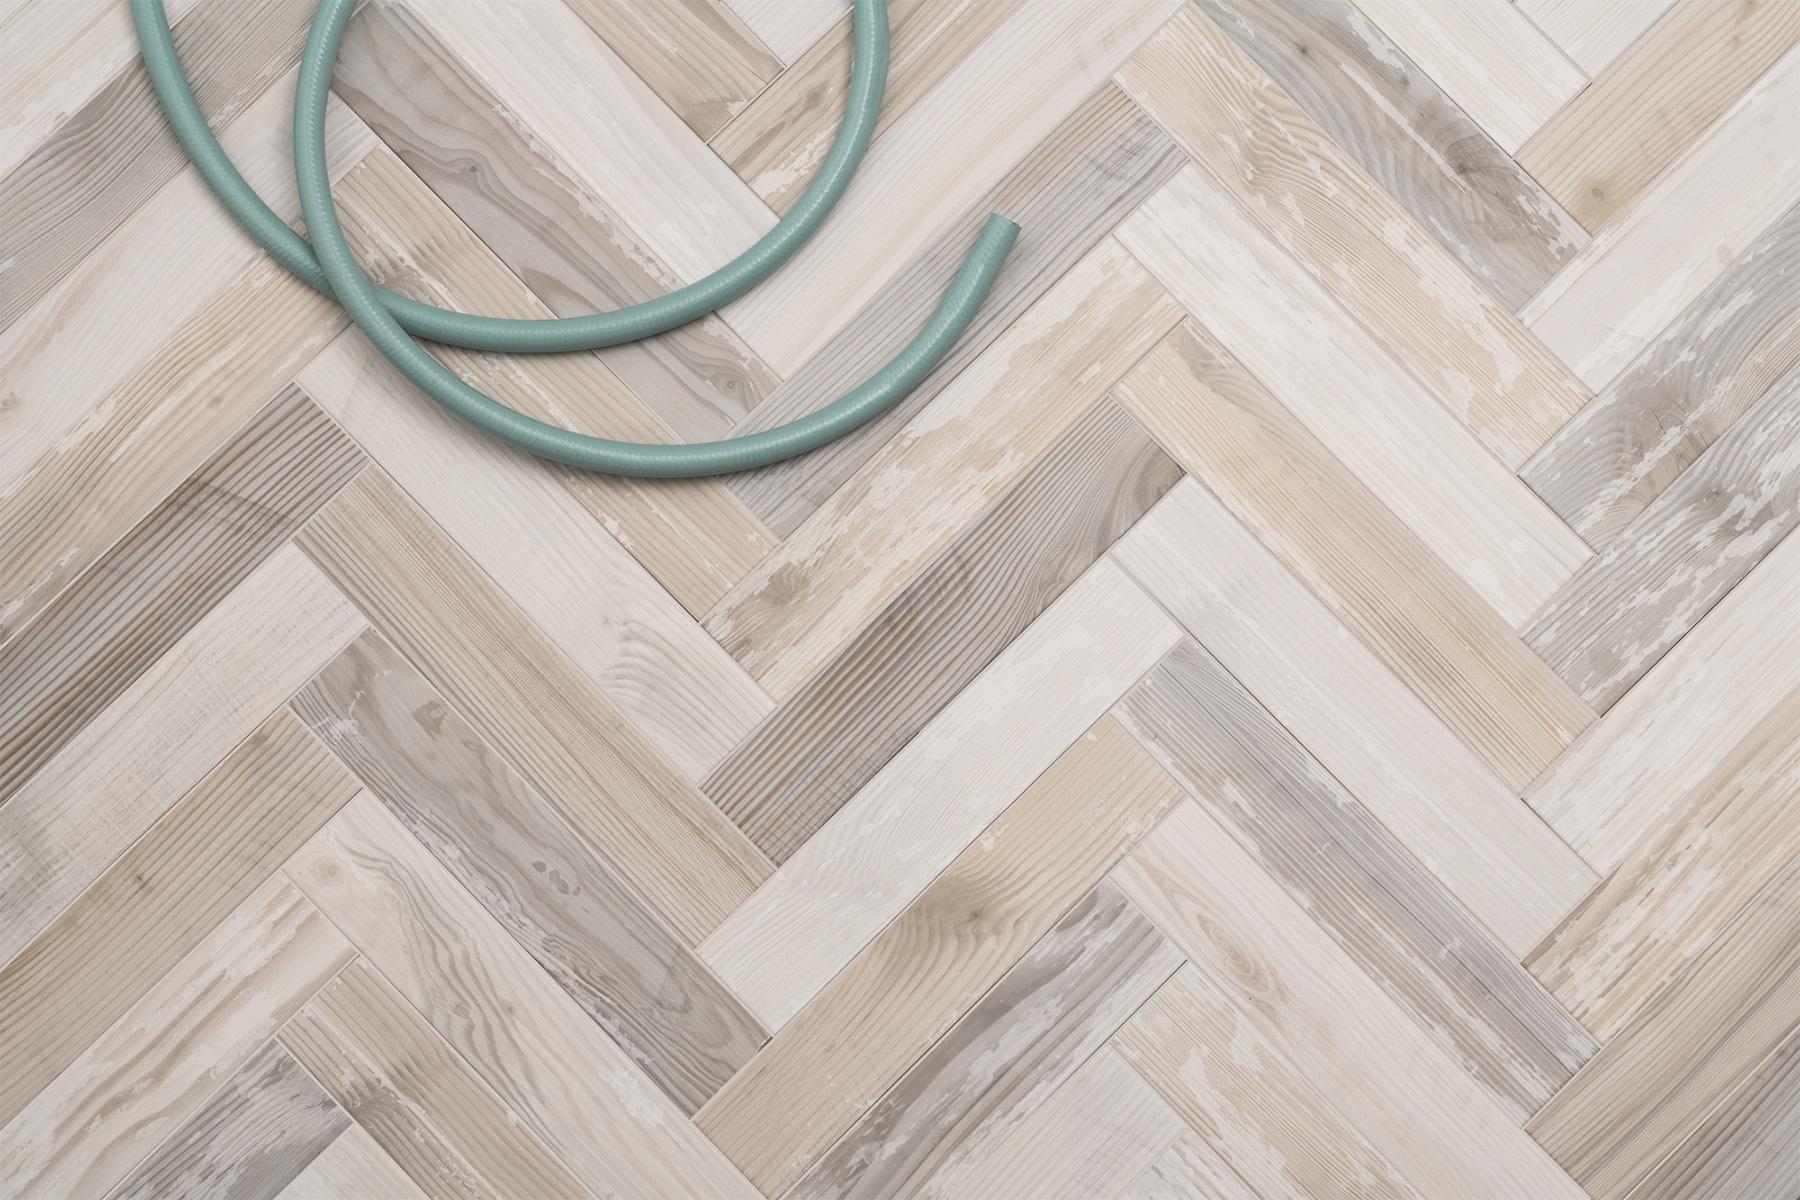 herringbone-pattern-tile-twin-cities